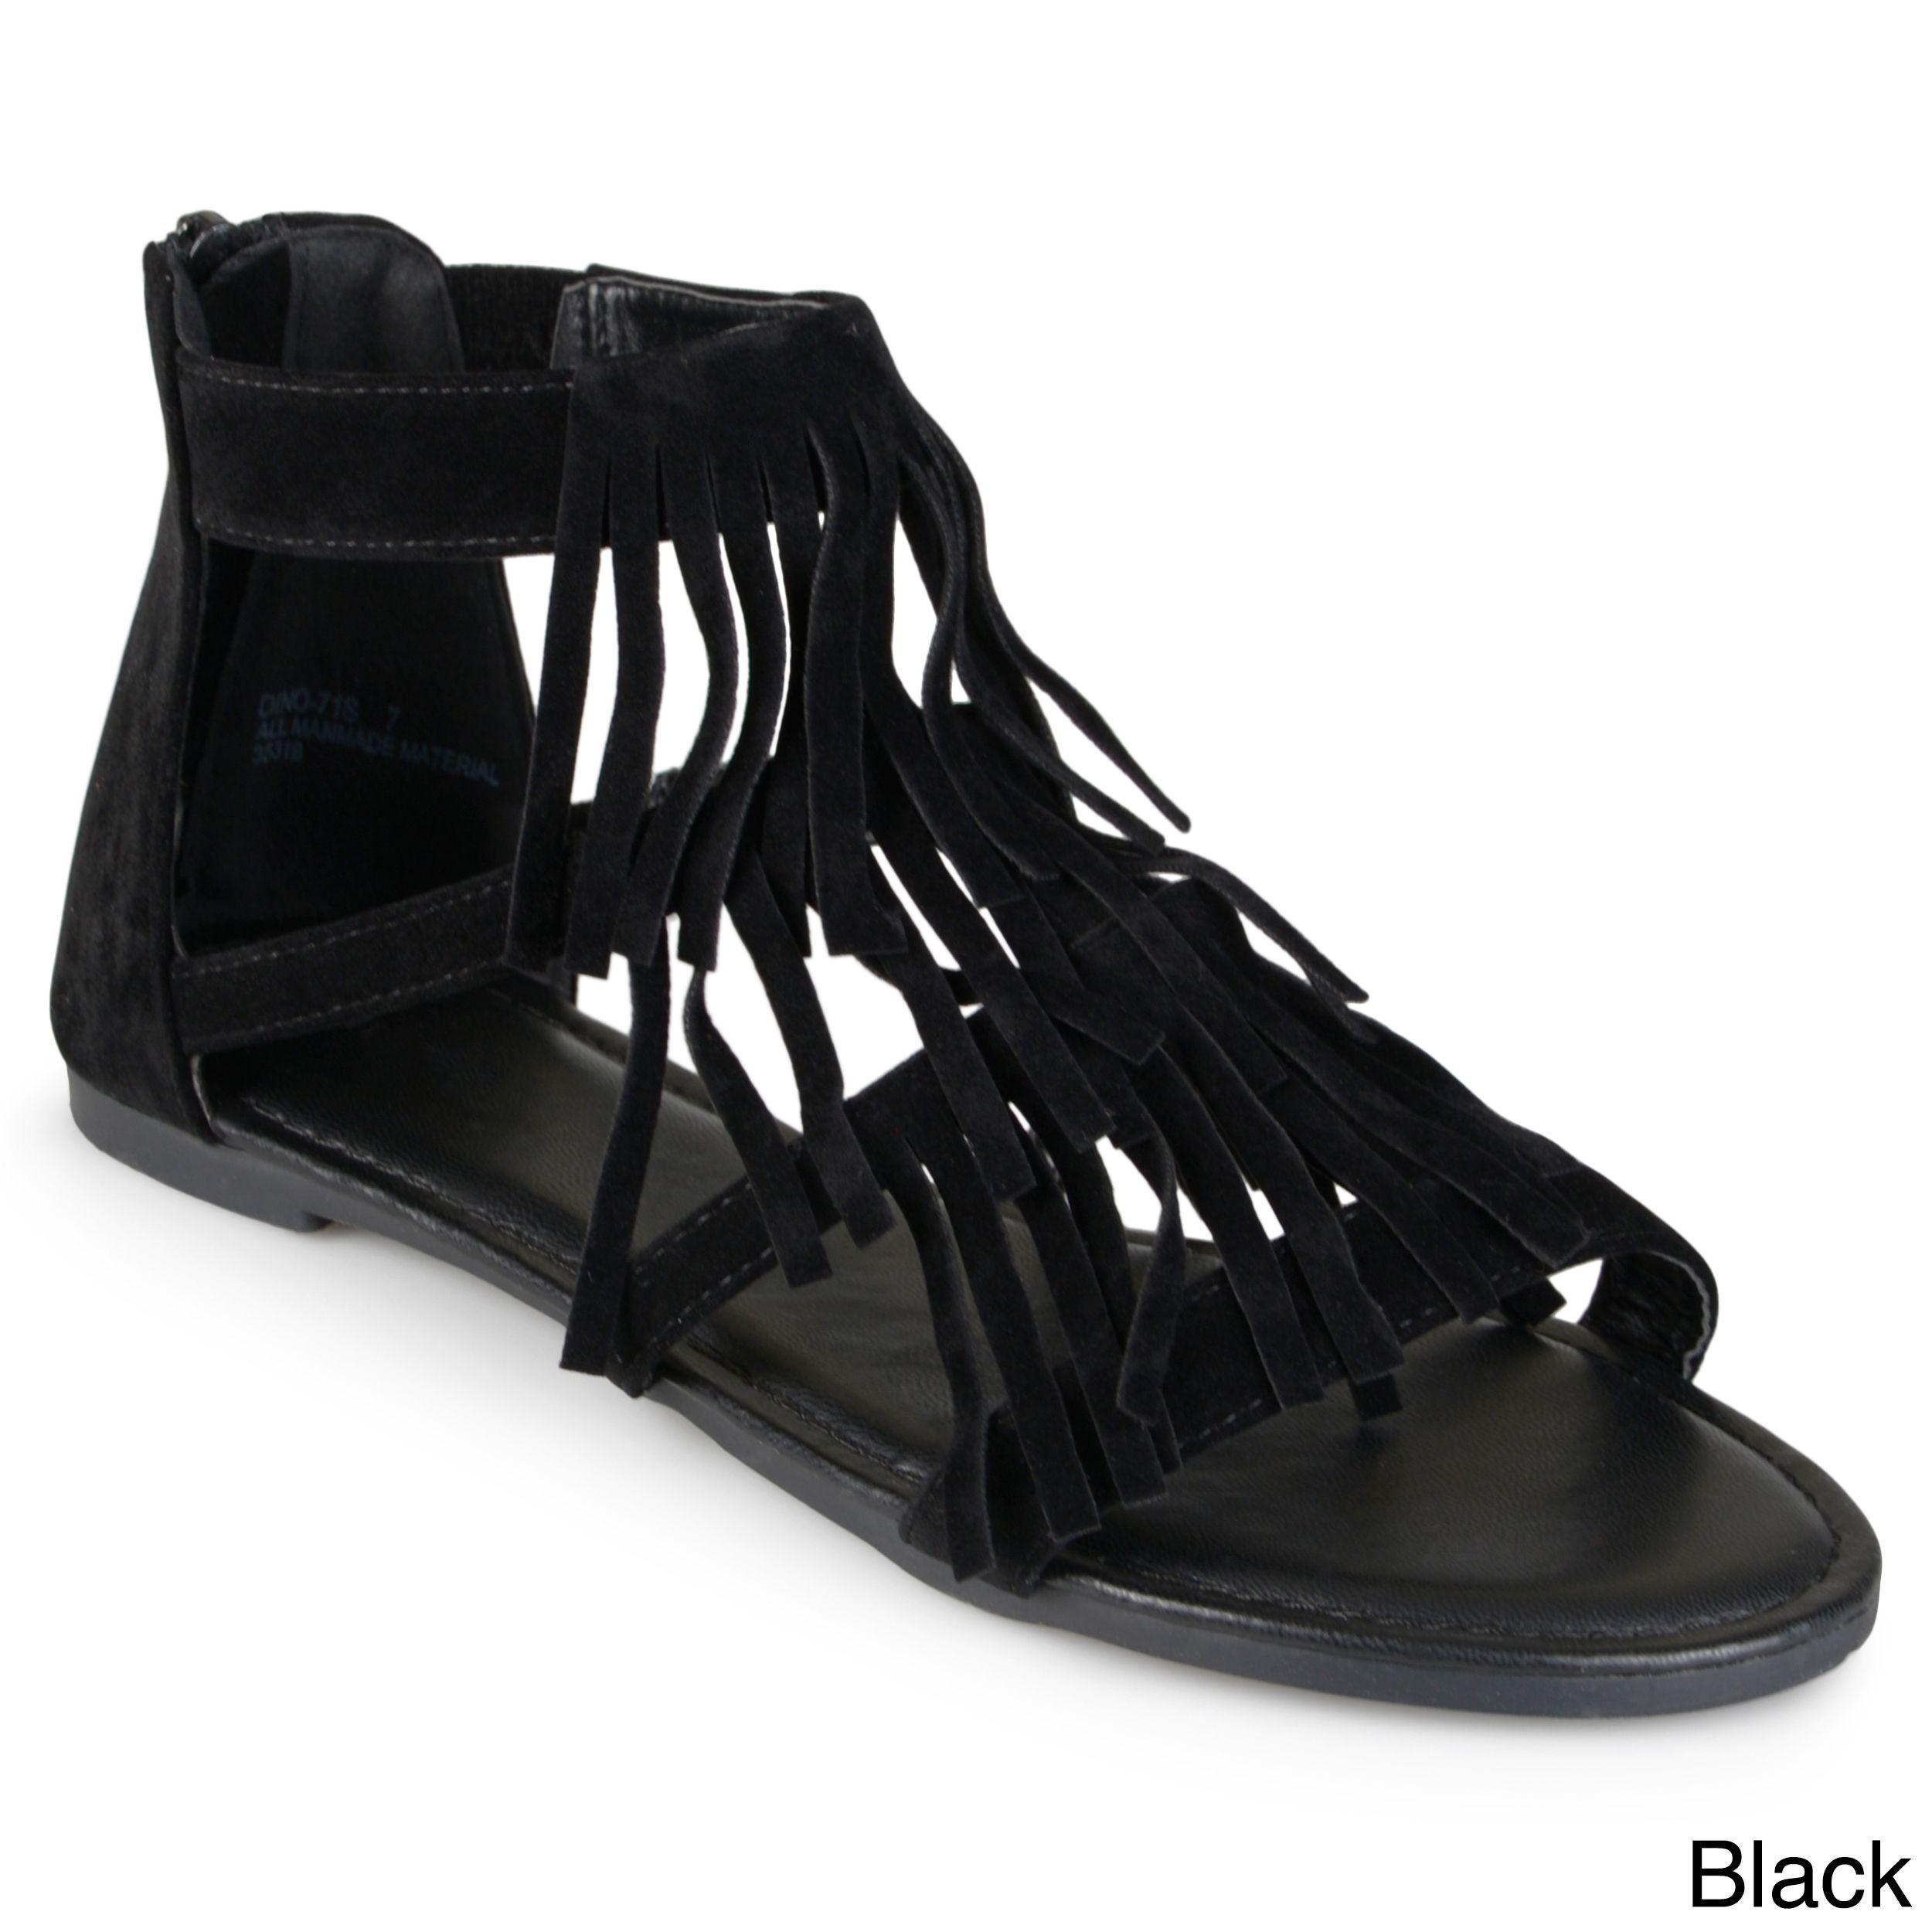 ea8d66e3e51c Journee Collection Women s  Zana  Fringed Flat Gladiator Sandals ...